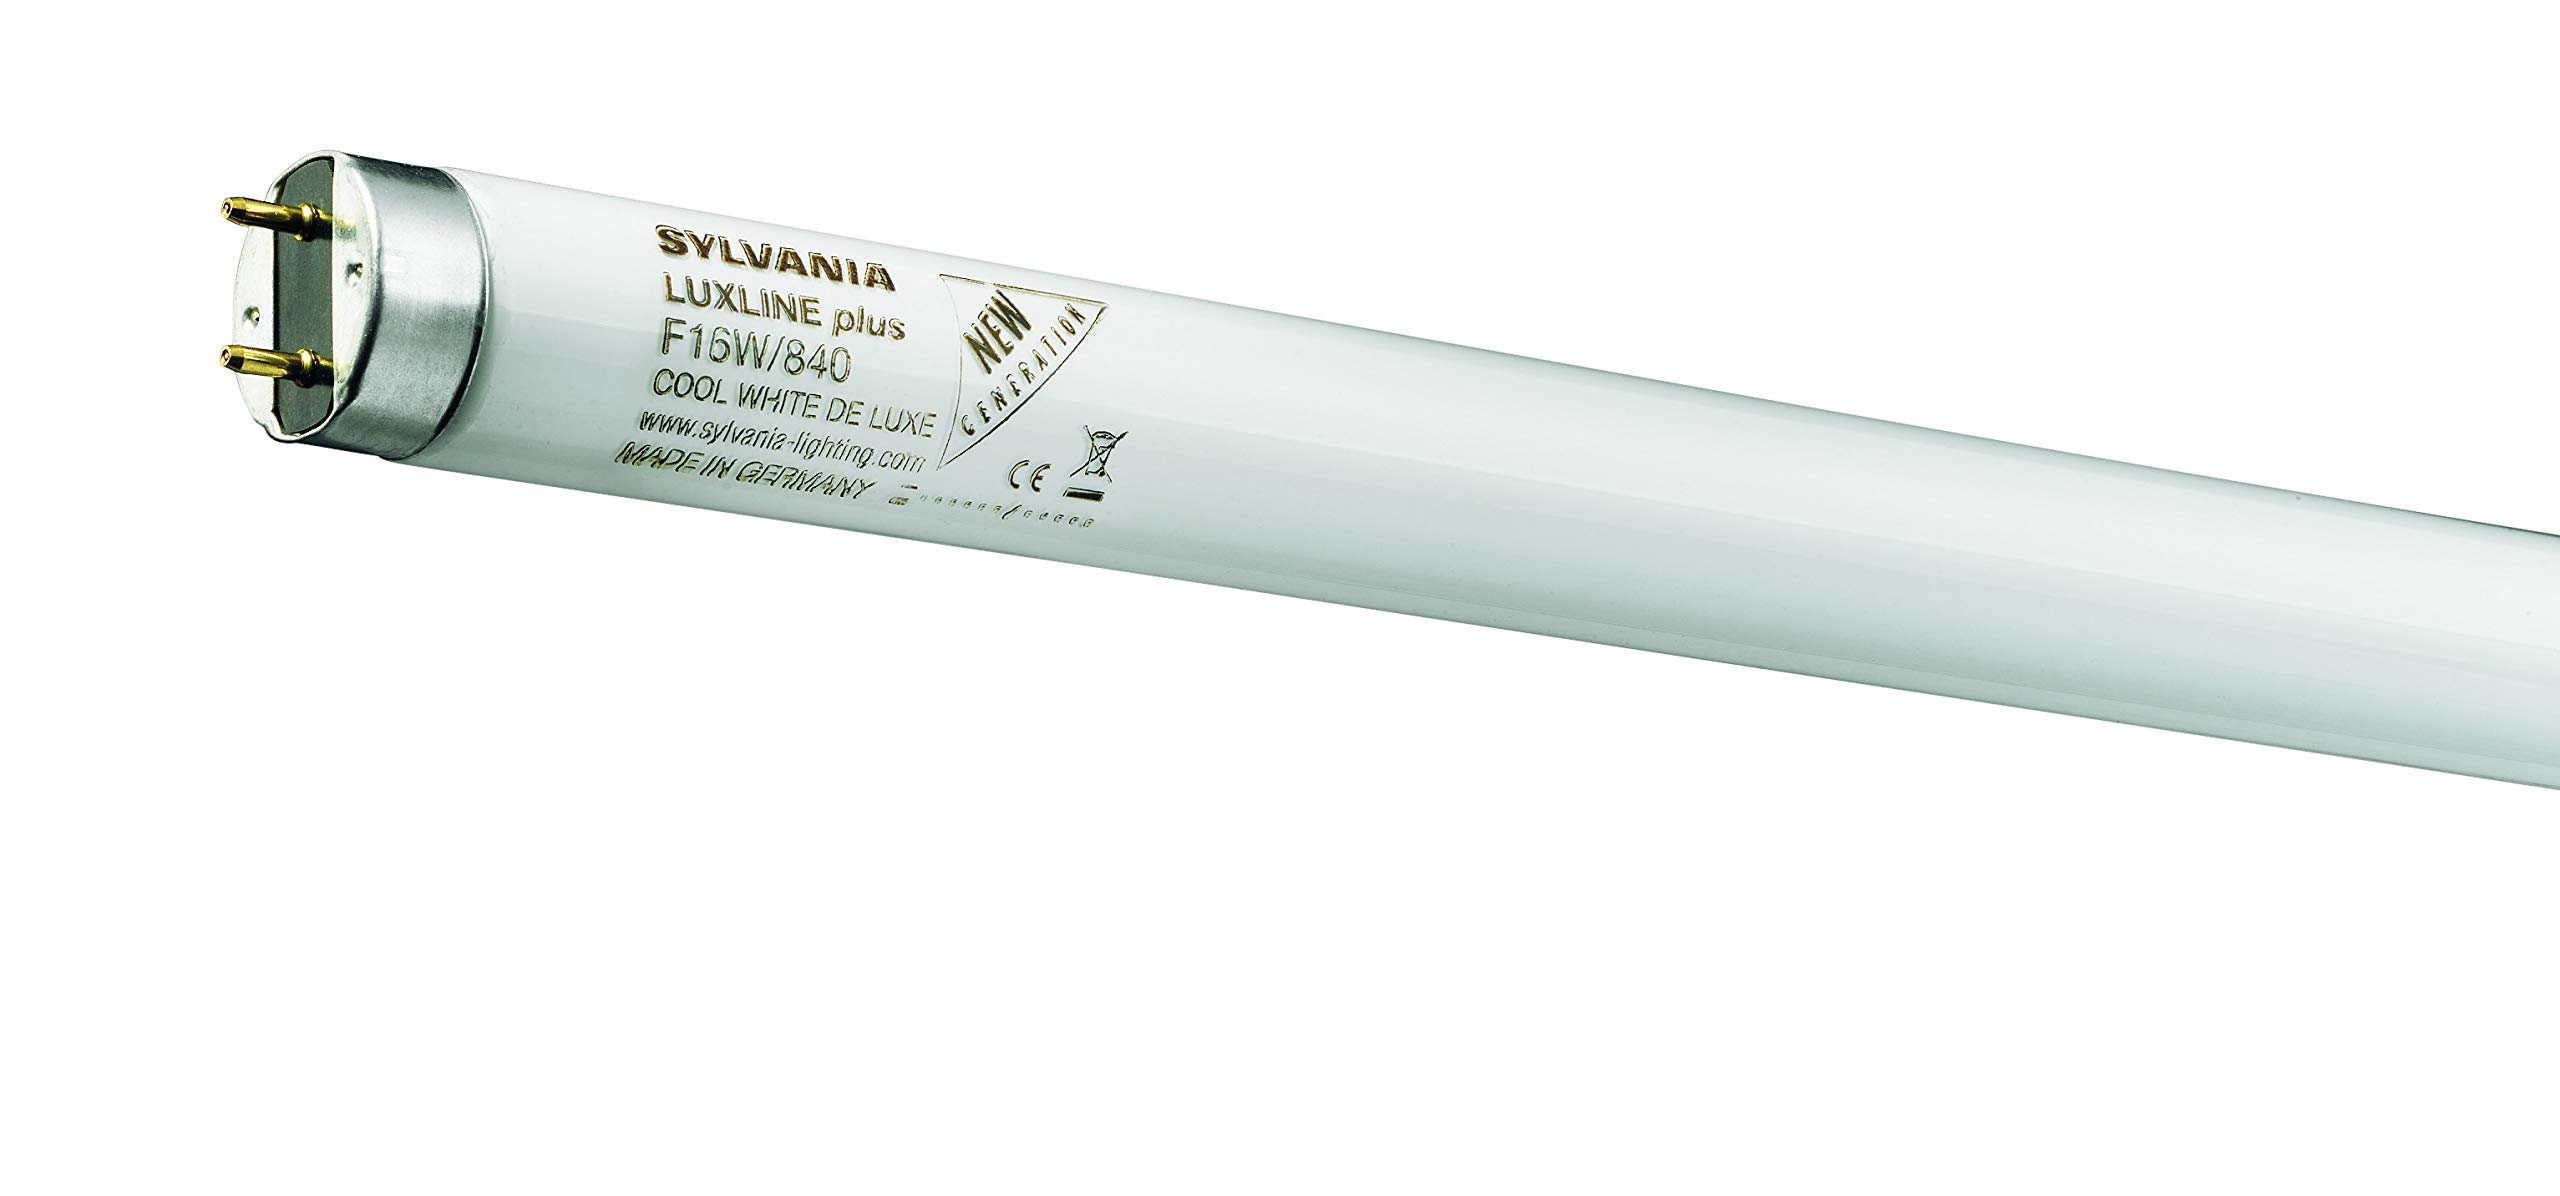 Sylvania F16w-29 T8 Fluorescent Tube 29inch 16W-Colour Cool White-840, G13, 16 W, White